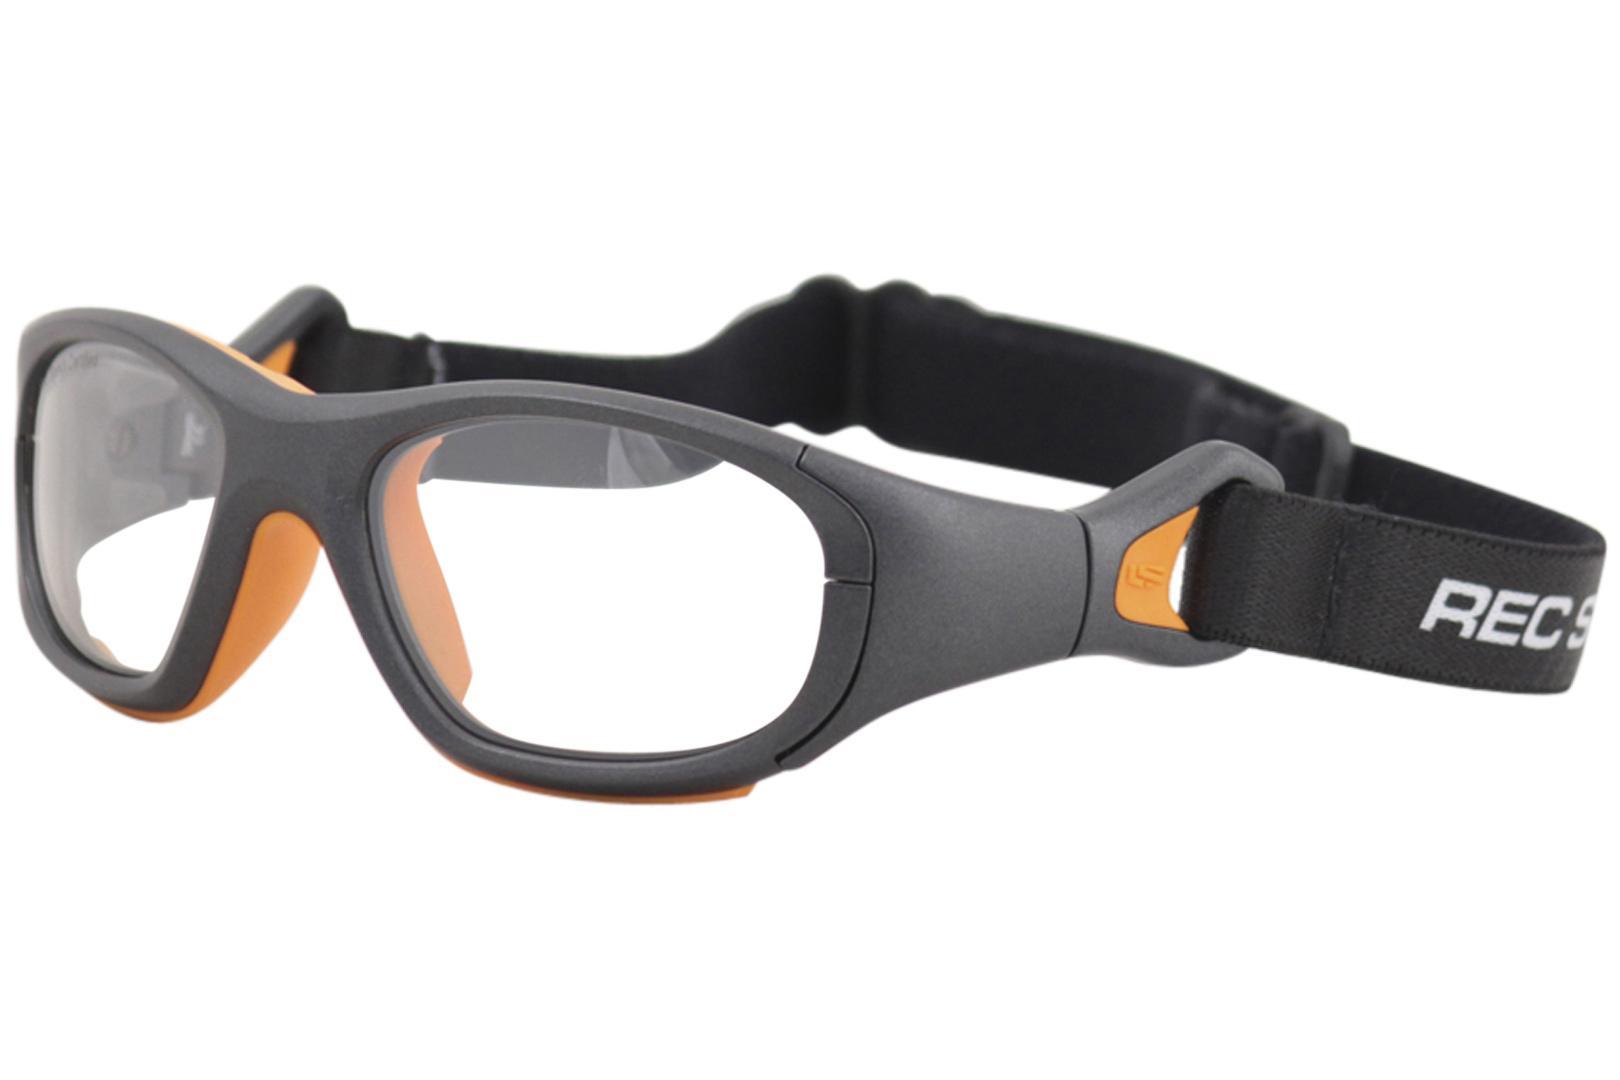 Image of - Gunmetal Orange/Clear Silver Mirror   325 - Lens 49 Bridge 16mm